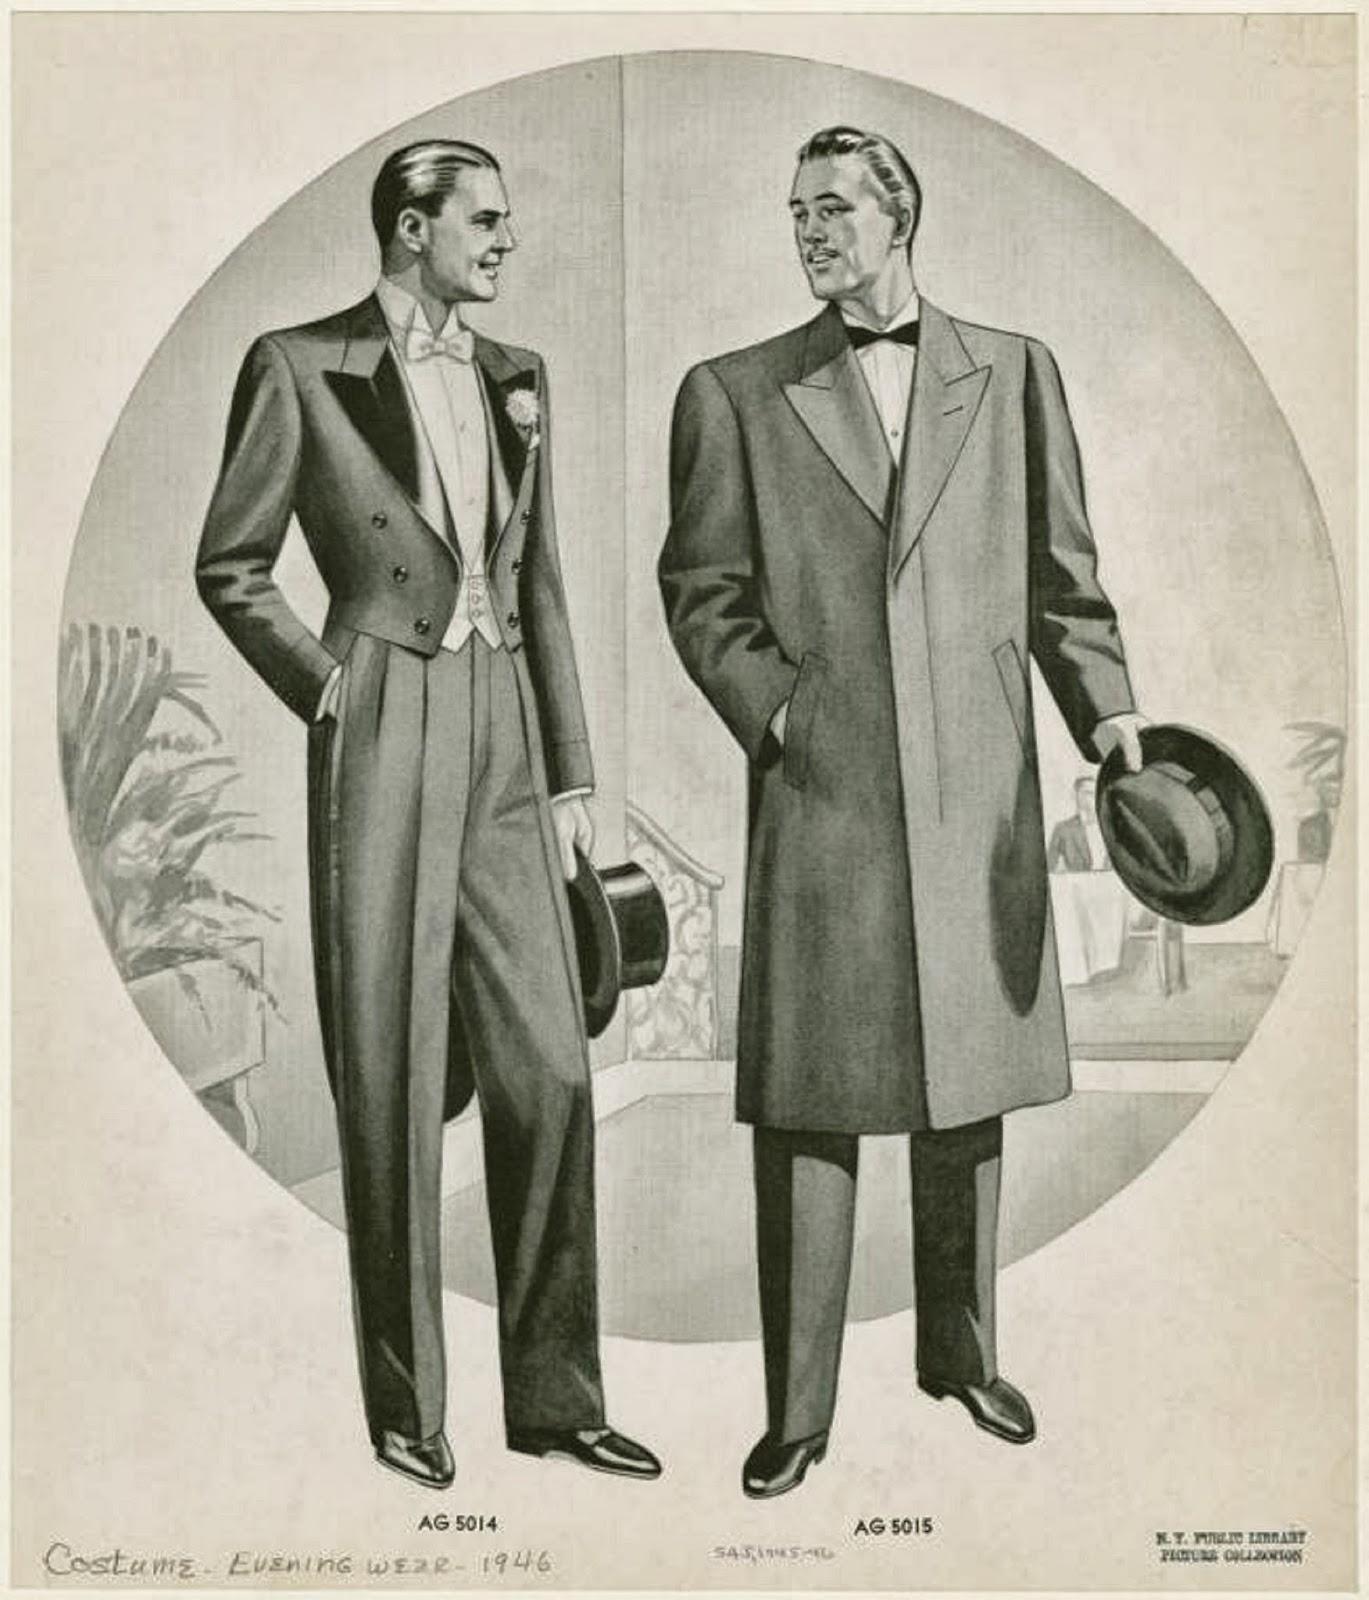 Evening wear for men,1946